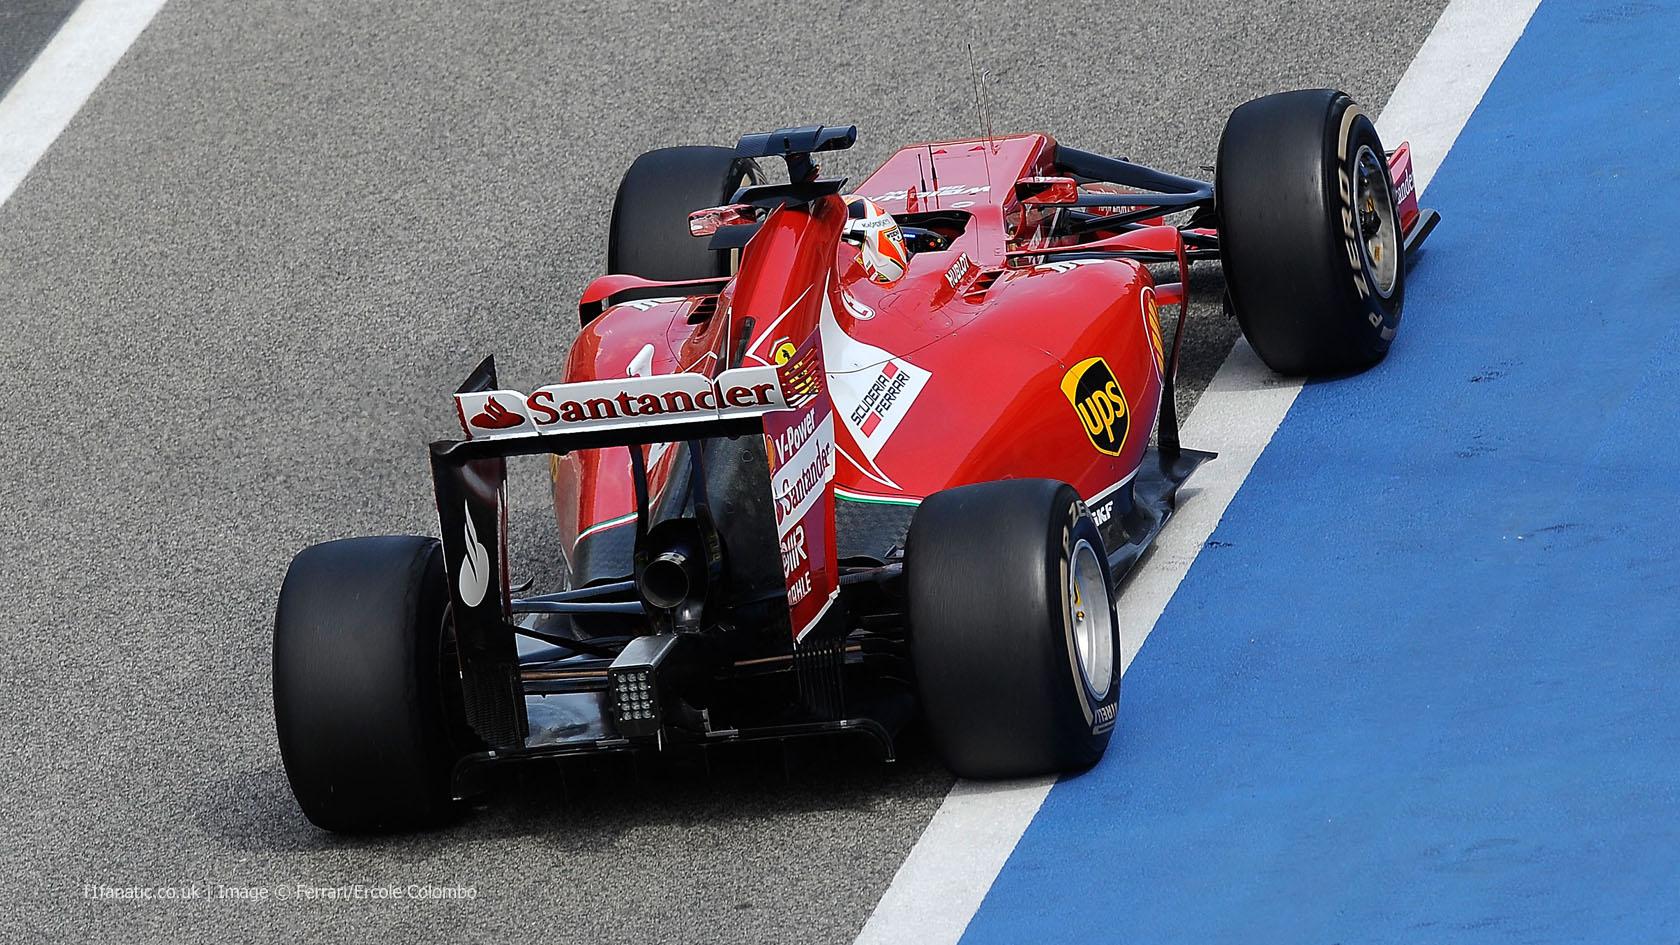 Kimi Raikkonen, Ferrari, Bahrain, 2014